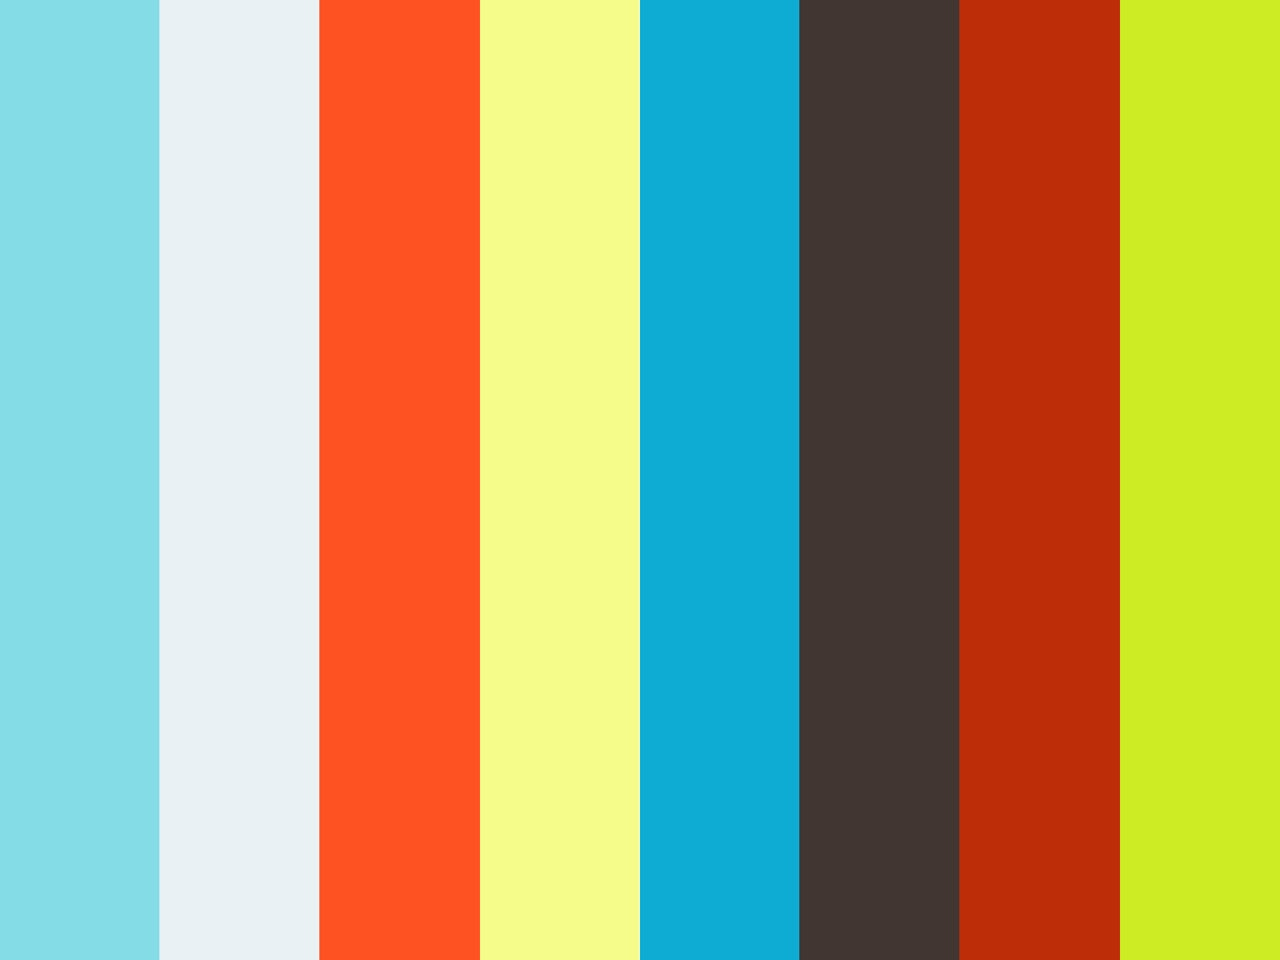 Listening is Loving | Yoko Sen, Joe Schlesinger, MD, & Elif Ozcan, PhD | STIR 2018